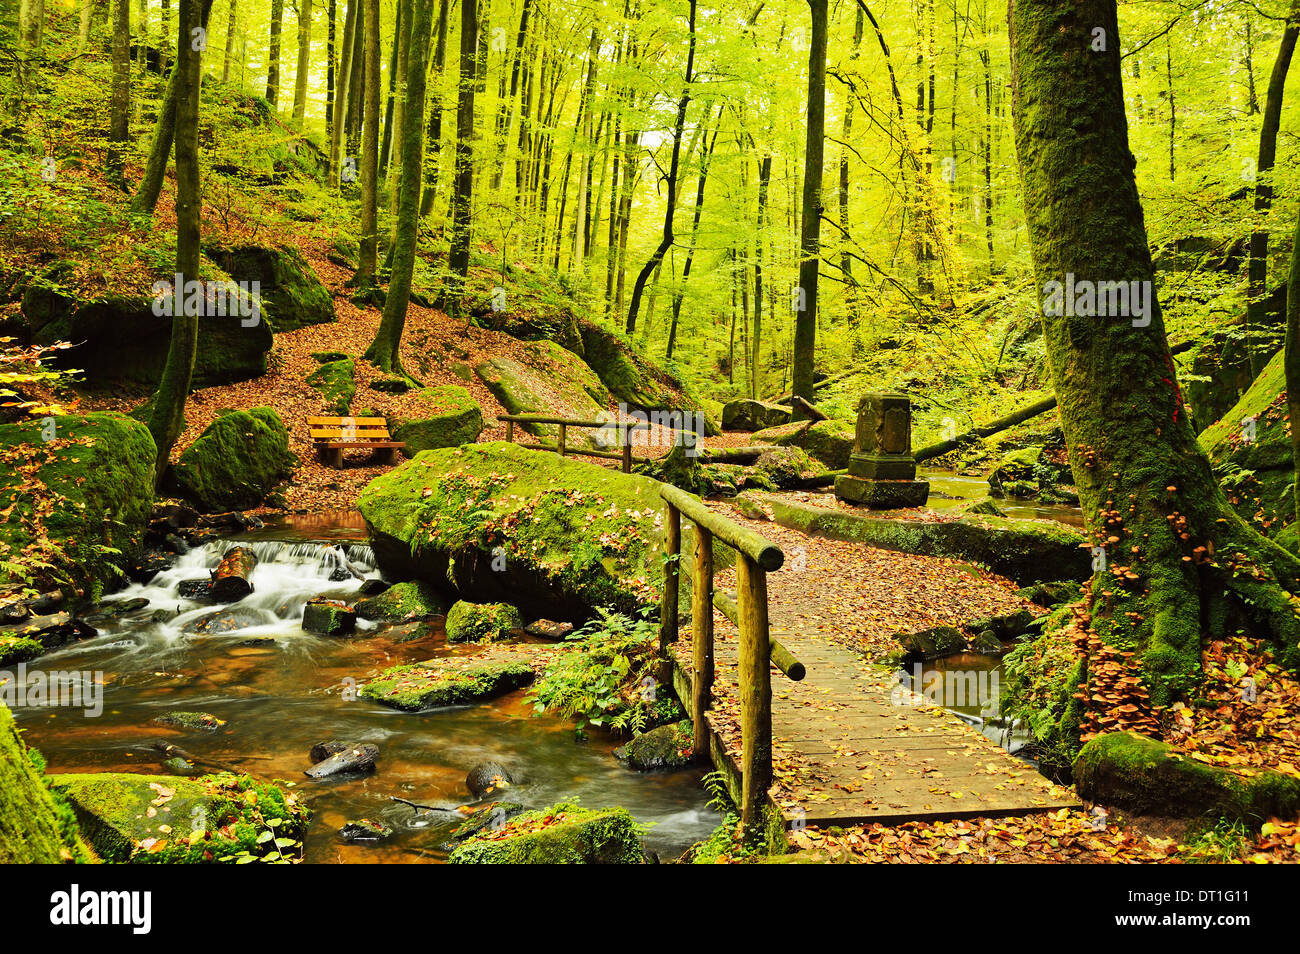 Karlstal gorge, near Trippstadt, Palatinate Forest, Rhineland-Palatinate, Germany, Europe - Stock Image